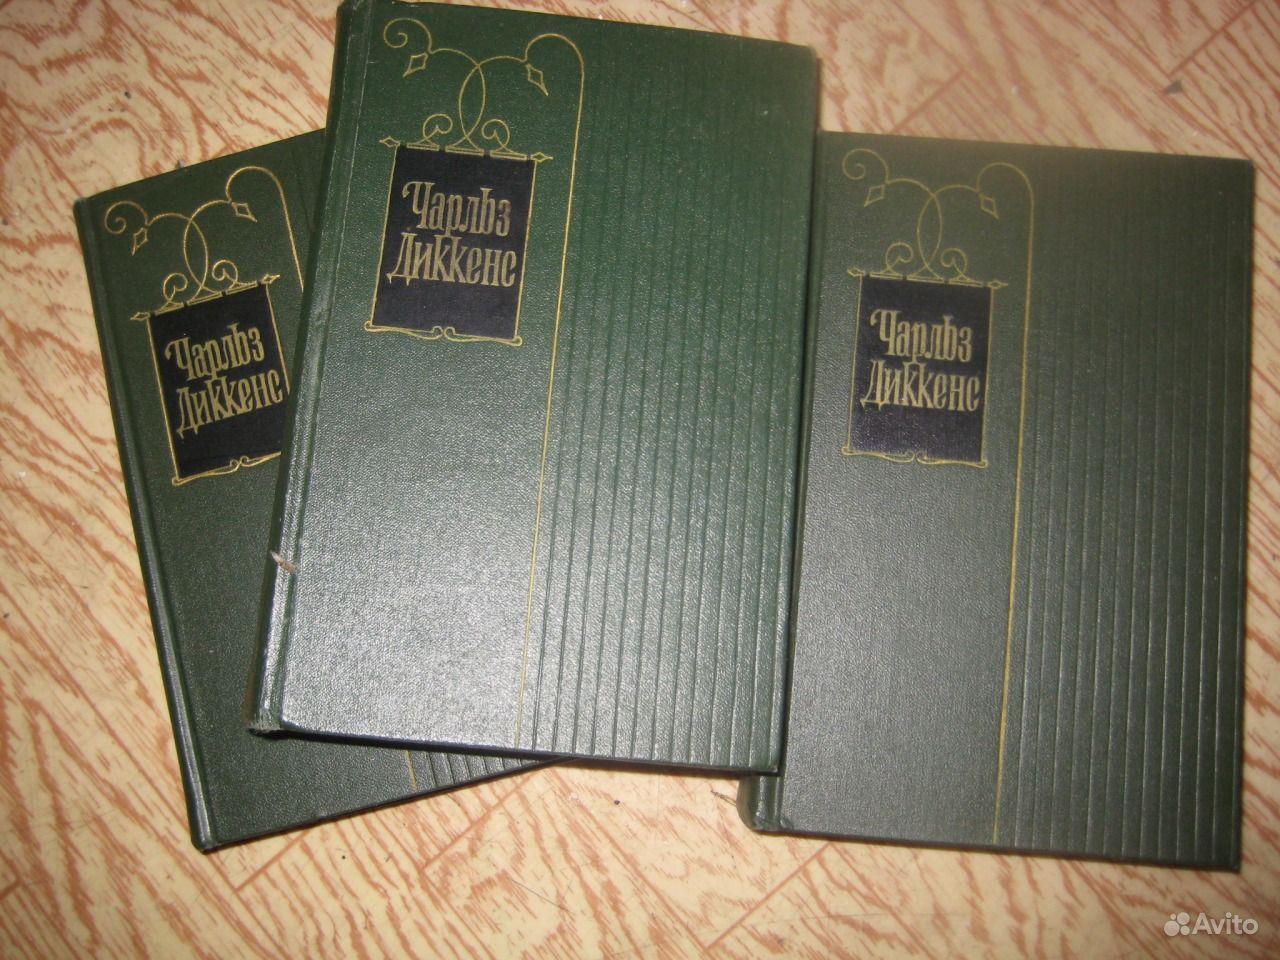 Чарльз Диккенс. Собрание сочинений в 30 томах.  Москва